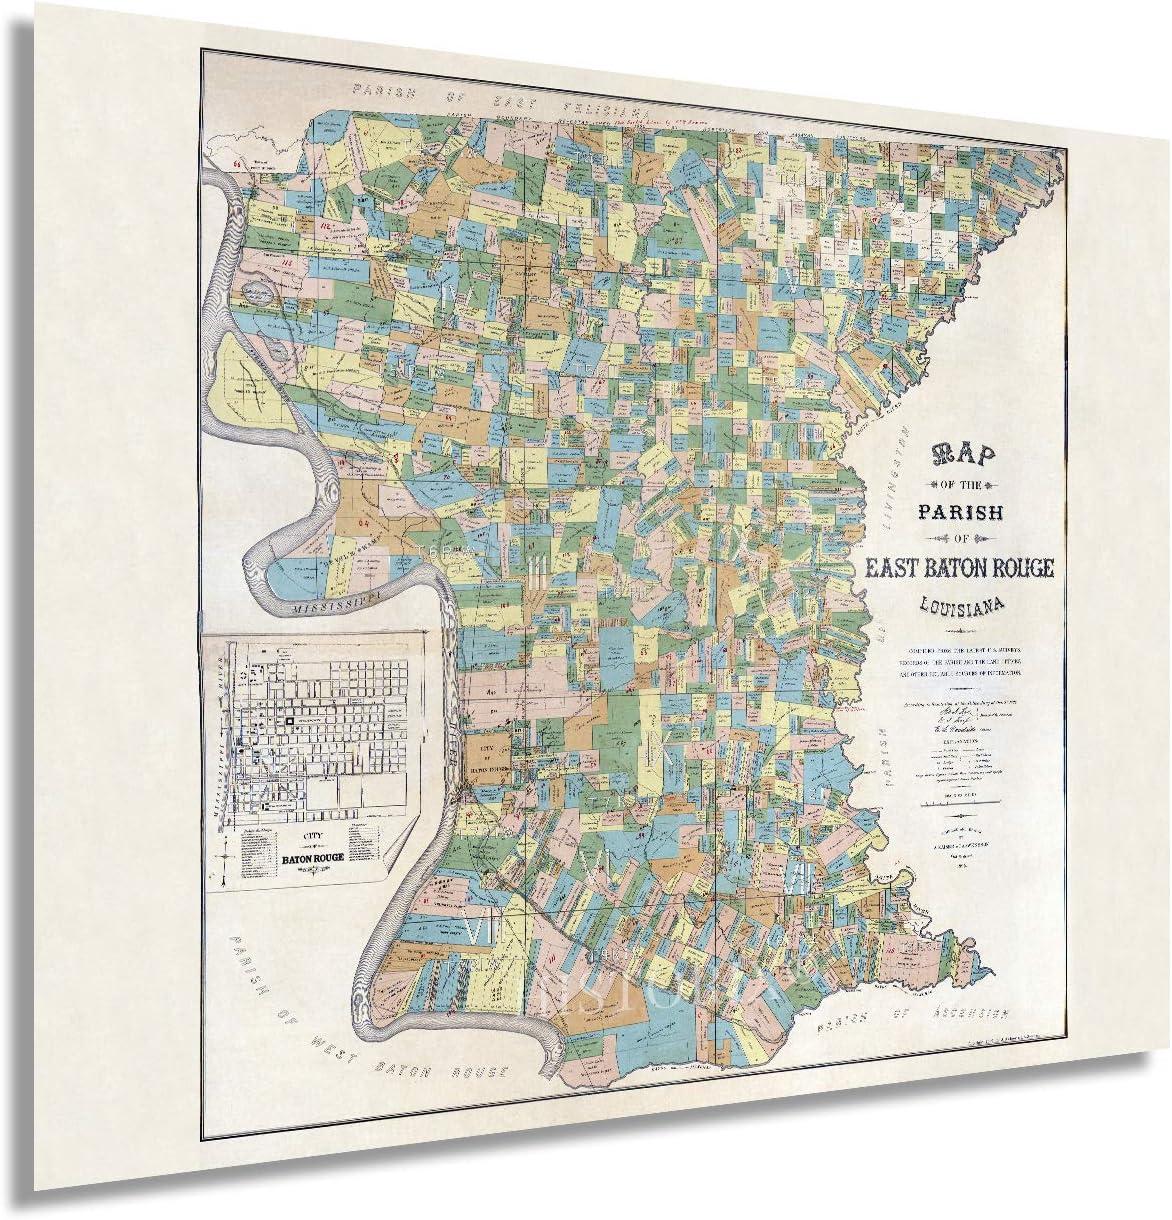 HISTORIX Vintage ◆セール特価品◆ 1895 East Baton Rouge Map 24 Louisiana ラッピング無料 Poster -